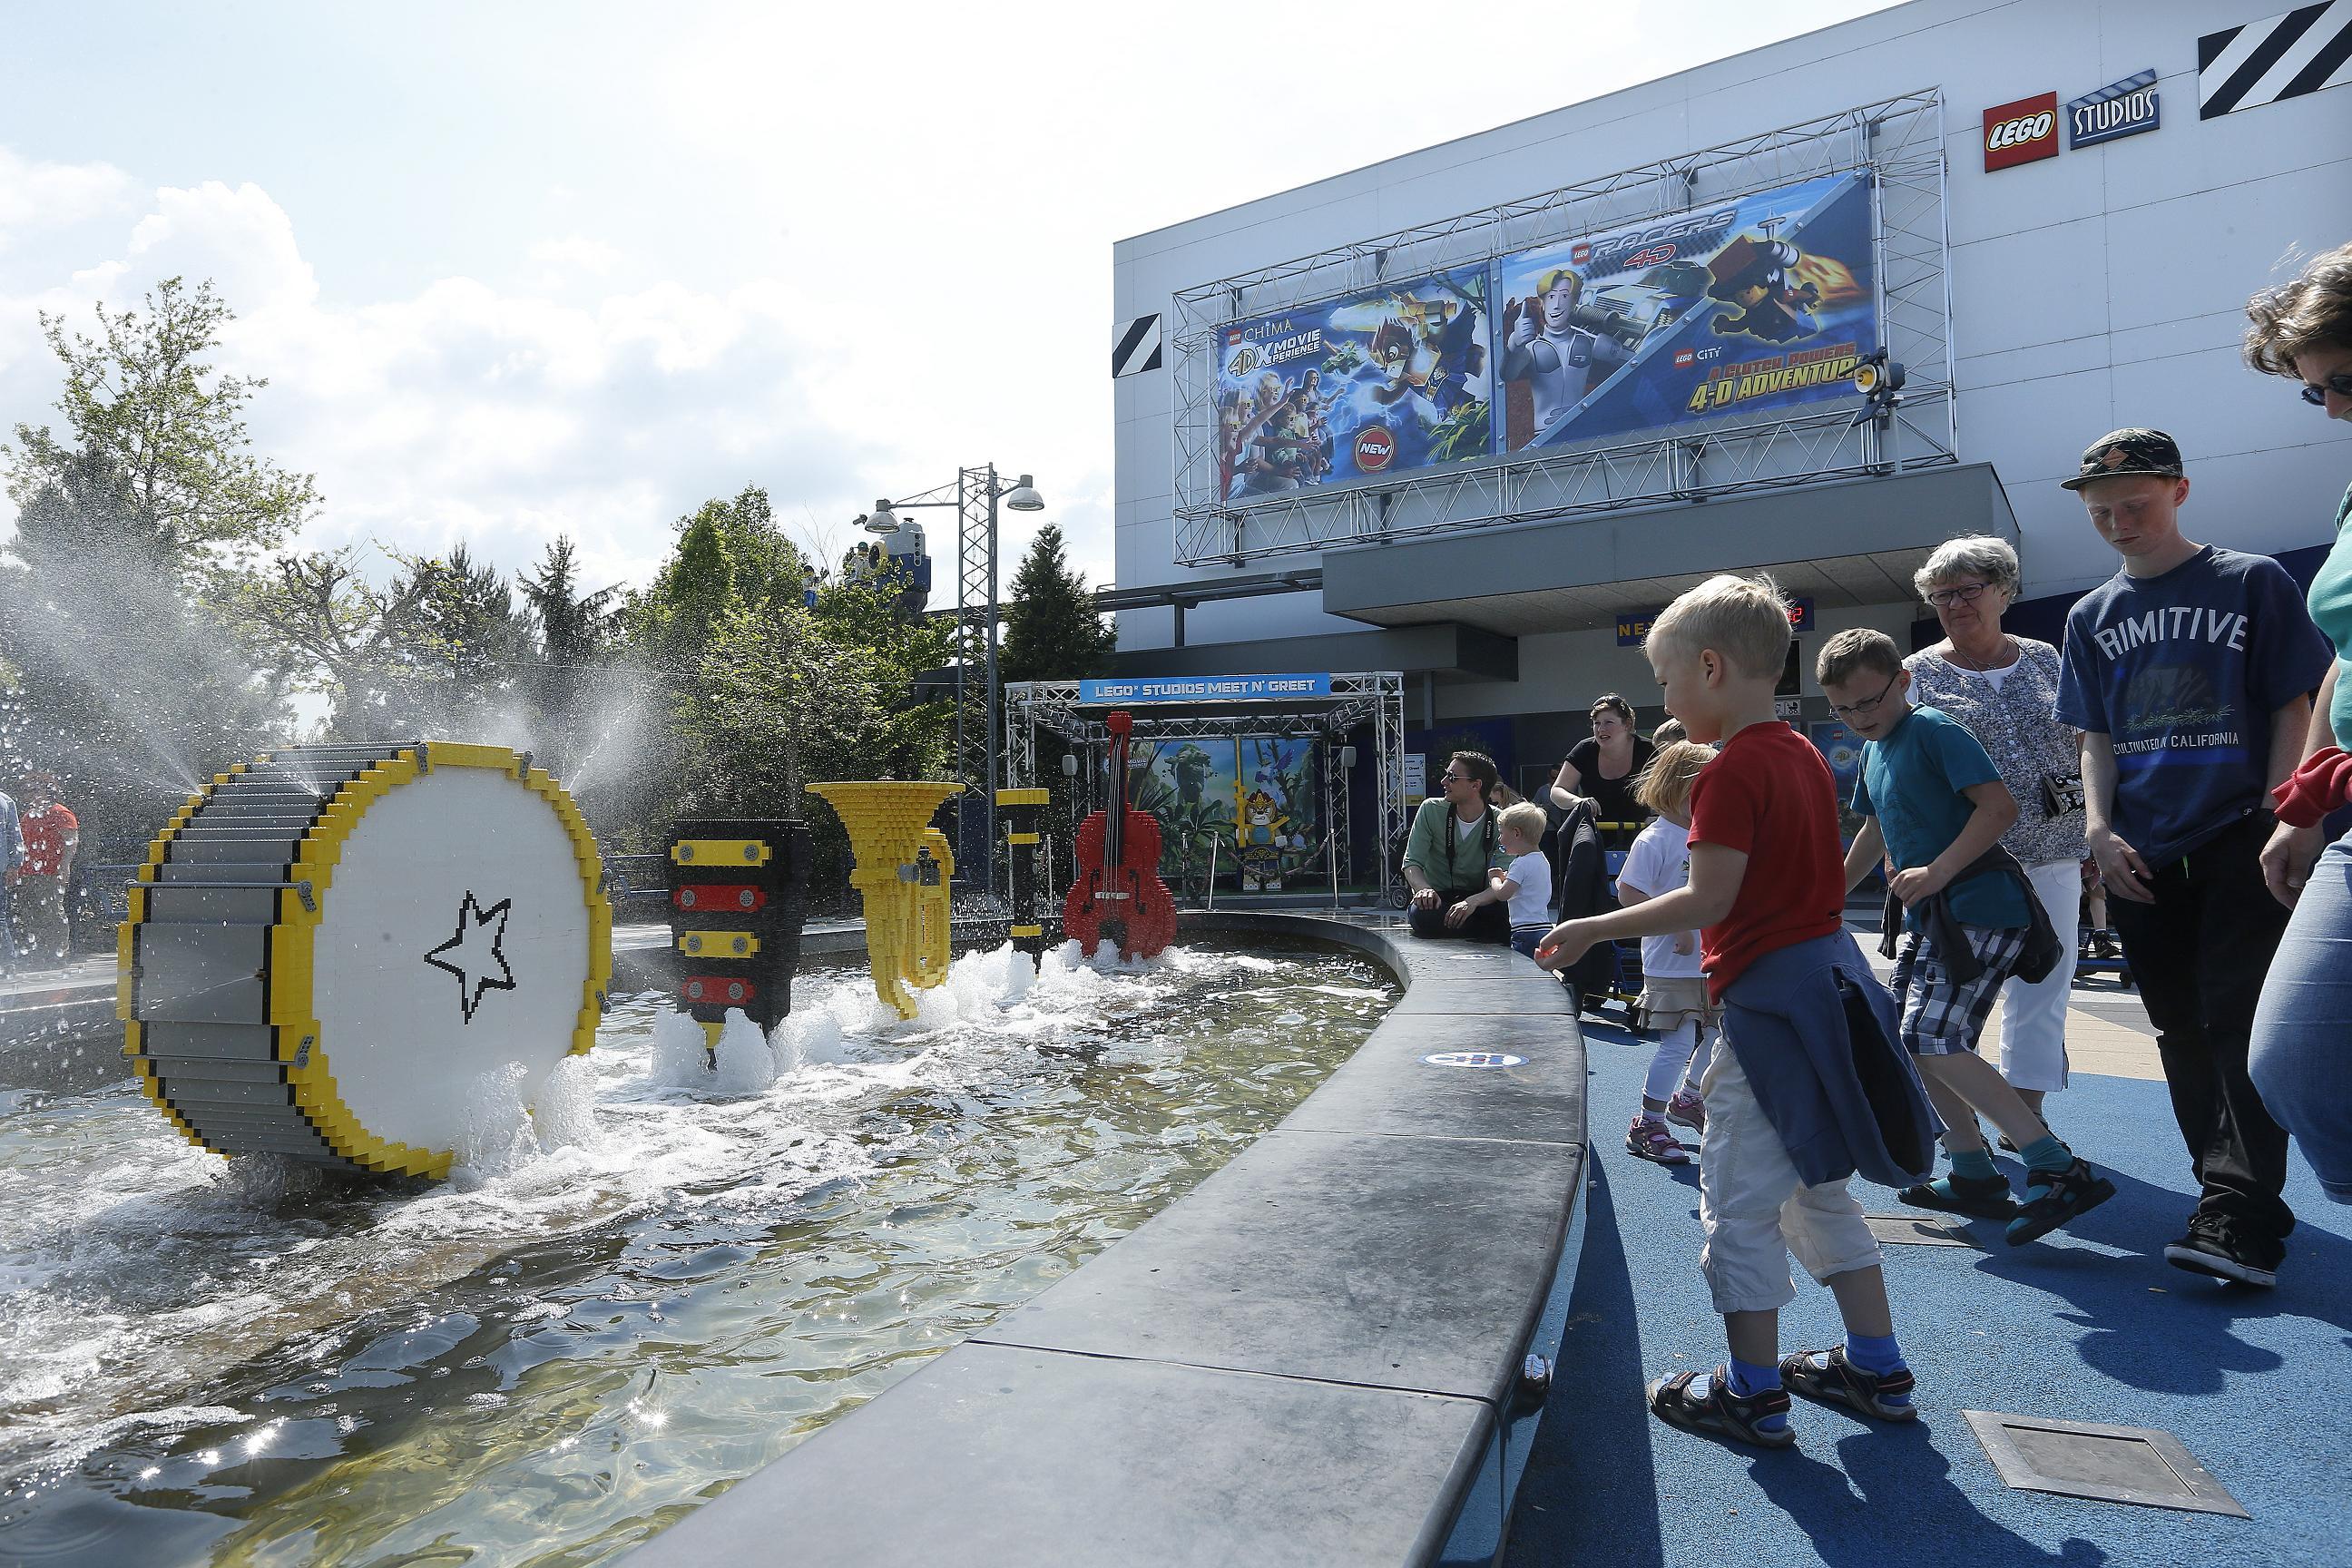 Imagination Zone Legoland Billund